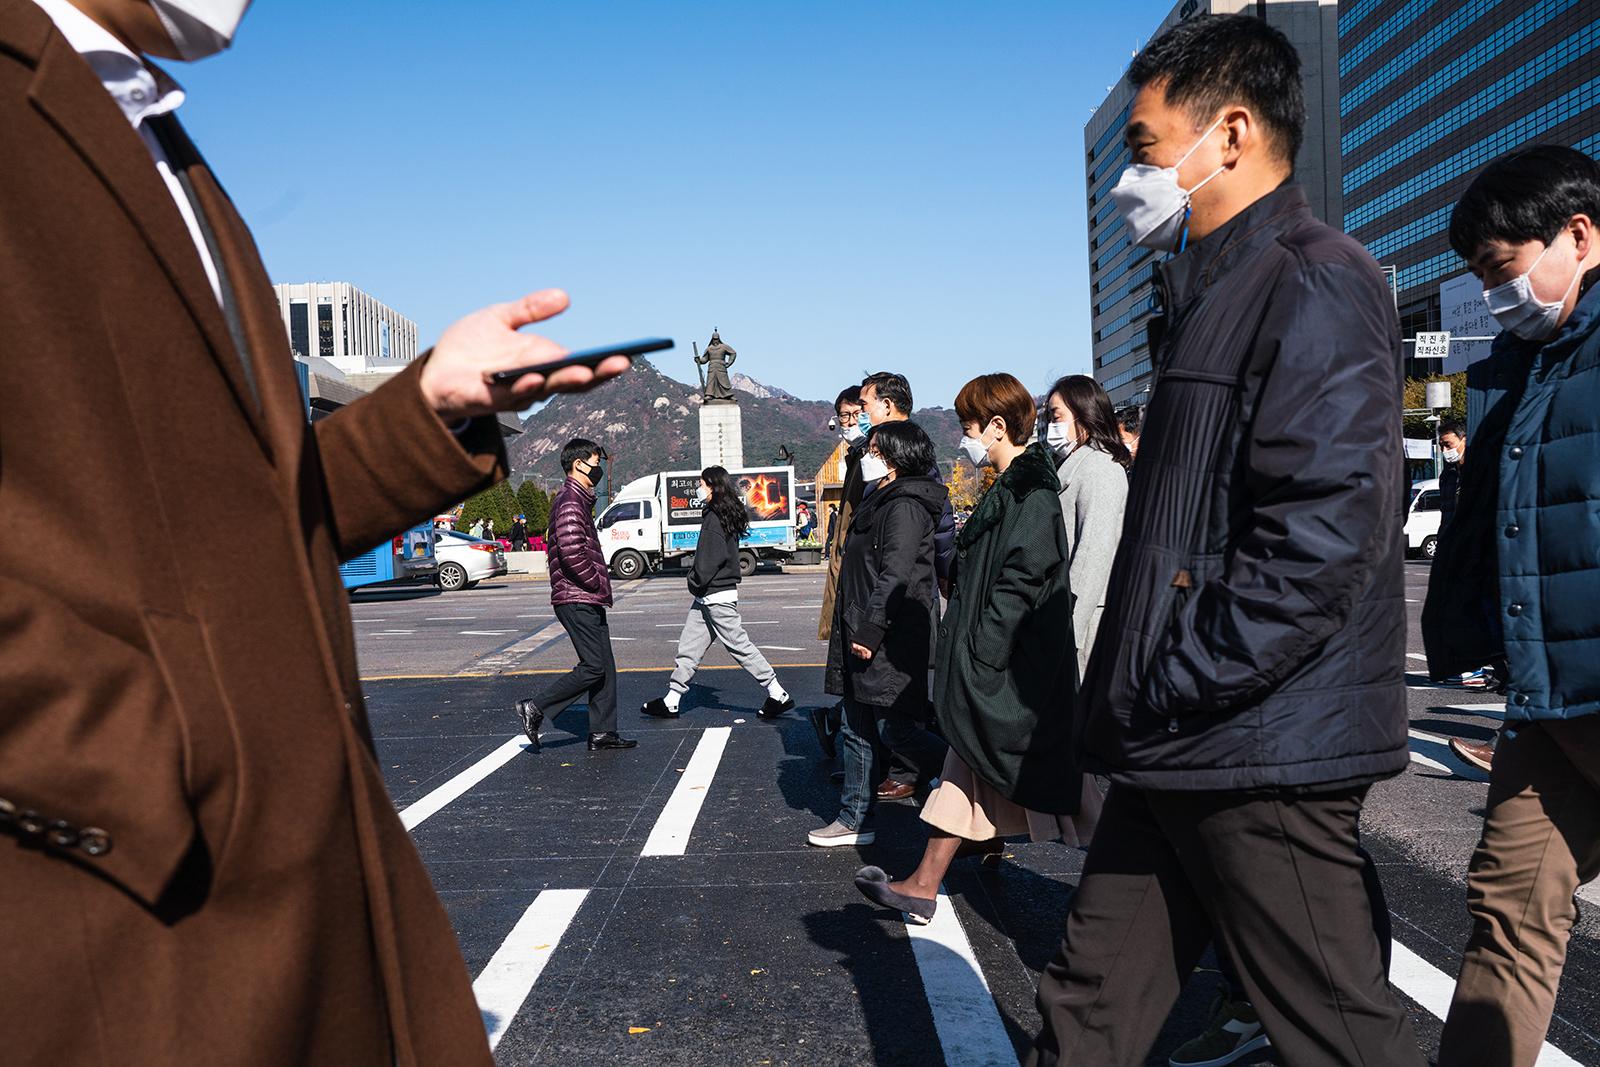 People wearing protective masks as preventative measures against coronavirus cross the road in Seoul, South Korea, on November 10.